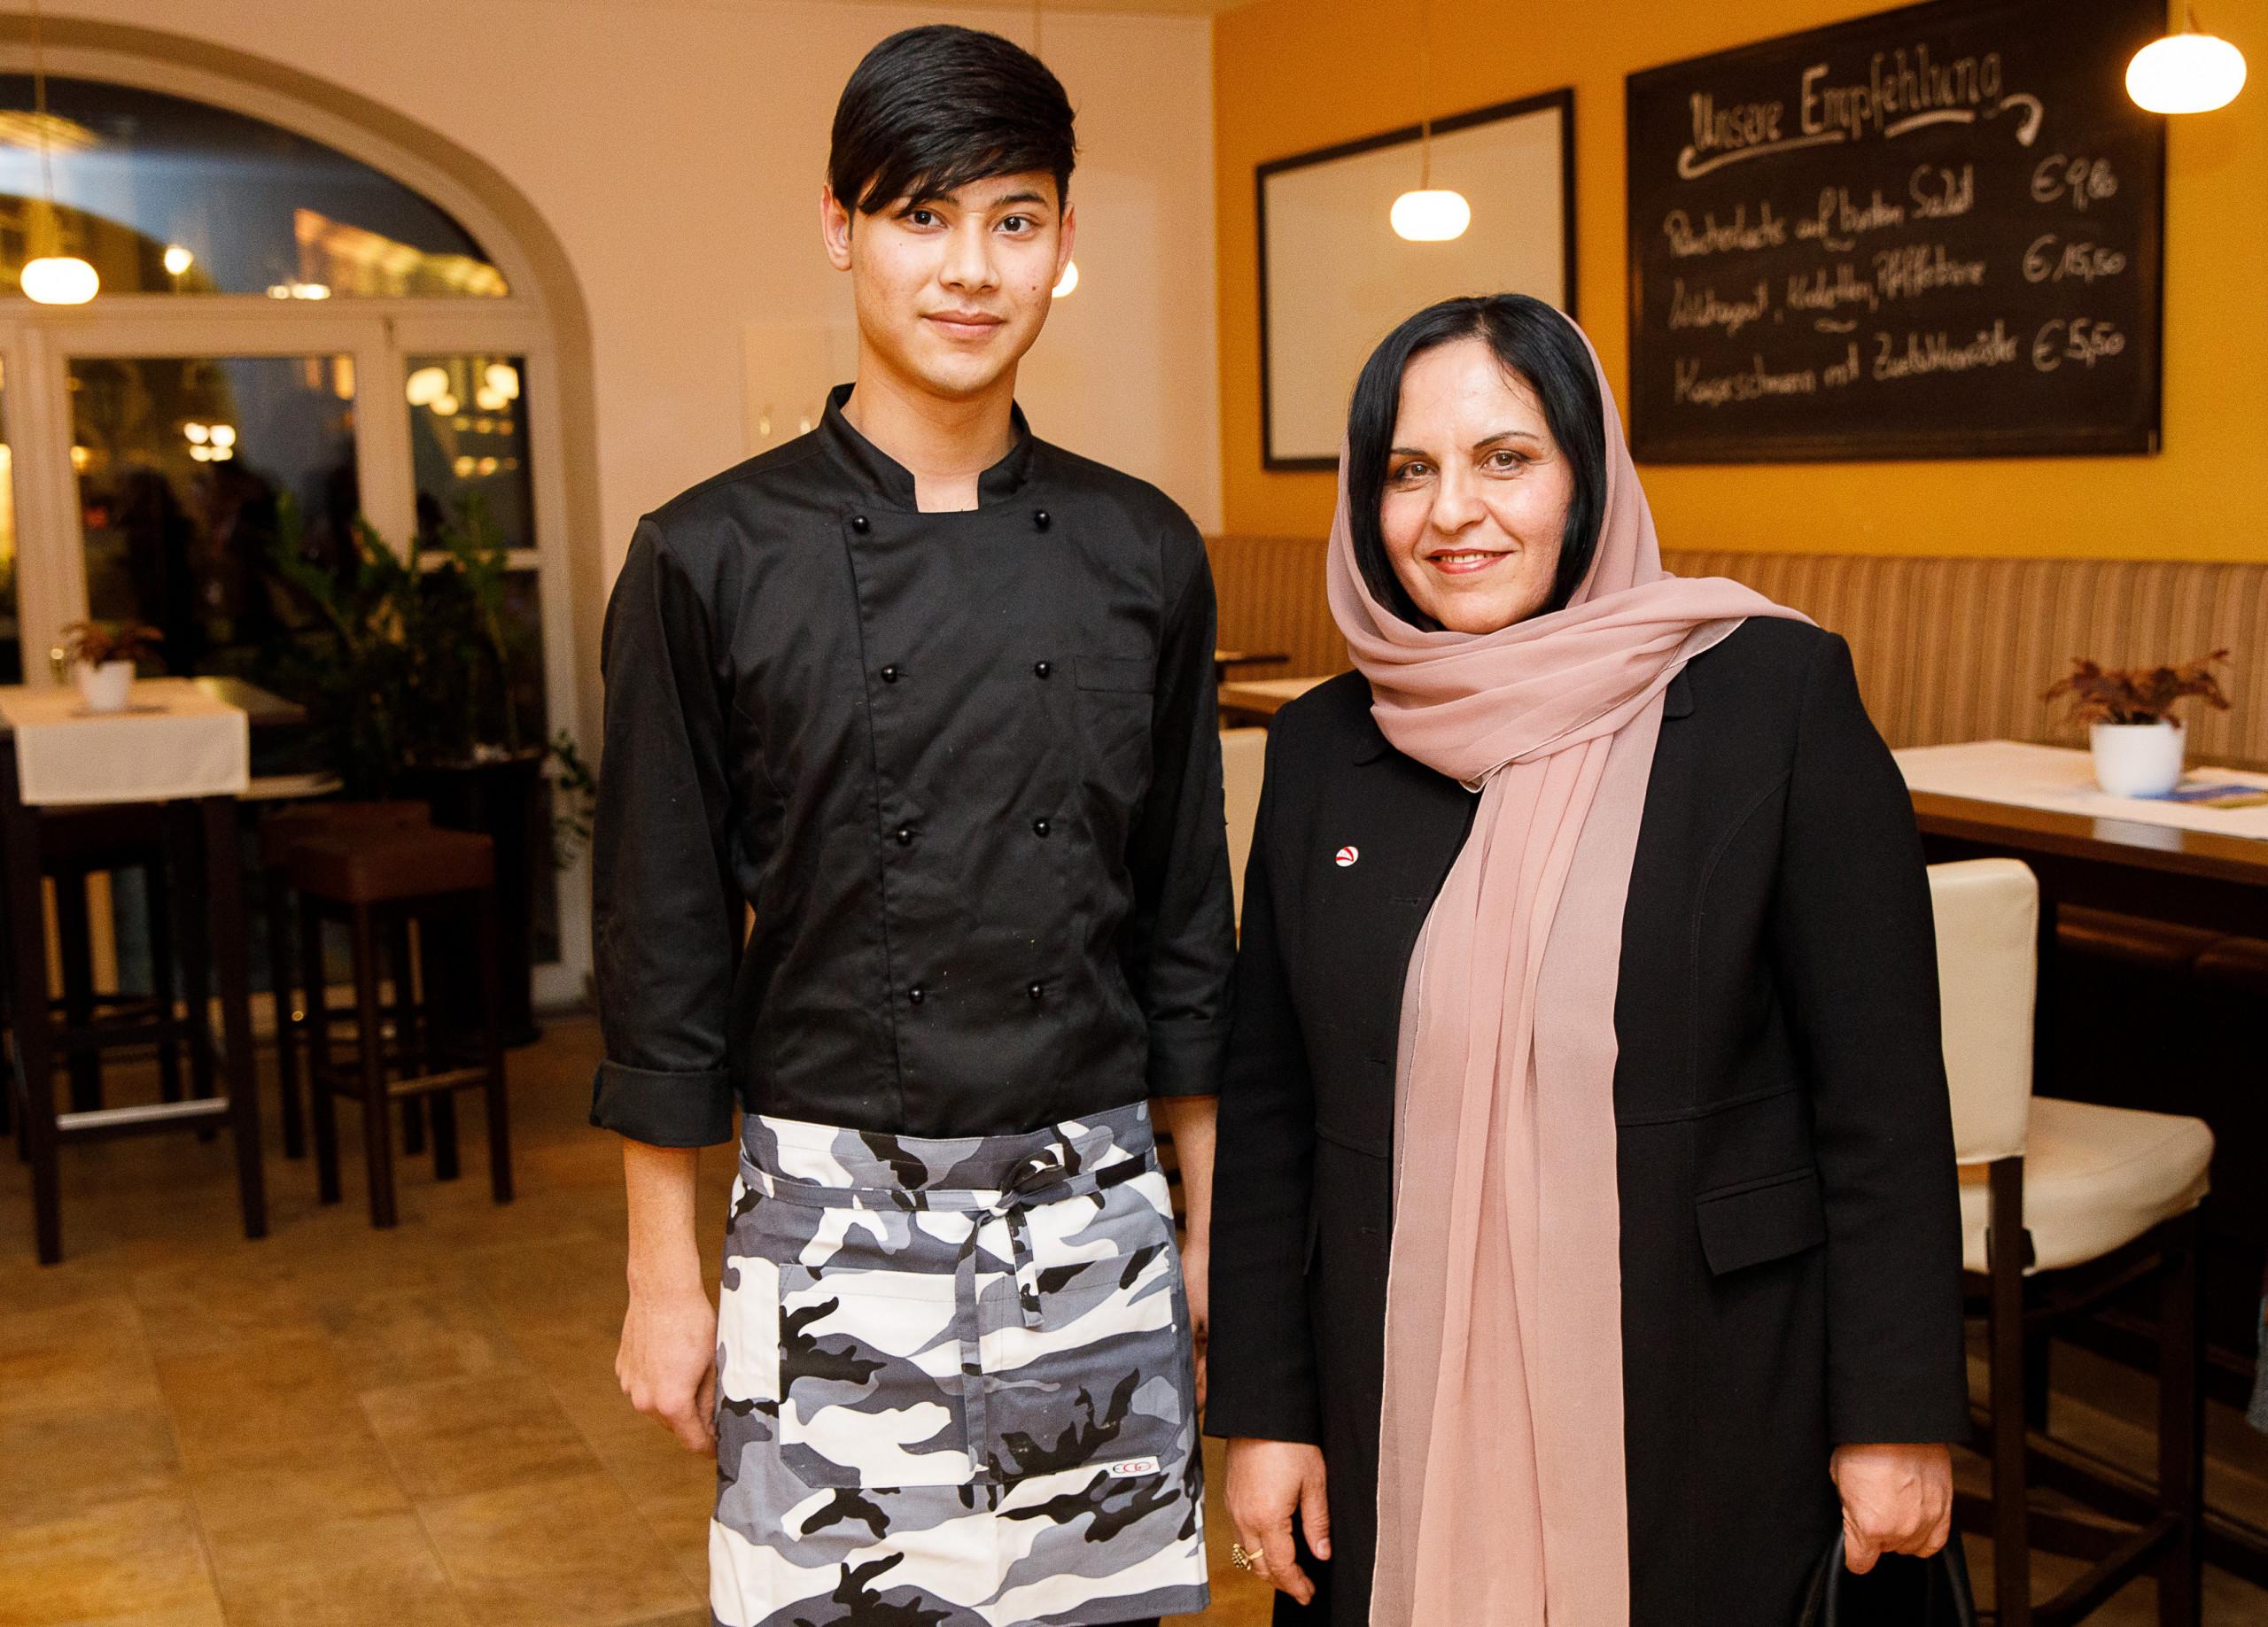 Mostafa Ahmadi is currently gastronomy apprentice, and next to him is Khojesta Fana Ebrahimkhel, Ambassador of Afghanistan in Austria. Photo: PaN / Wieser